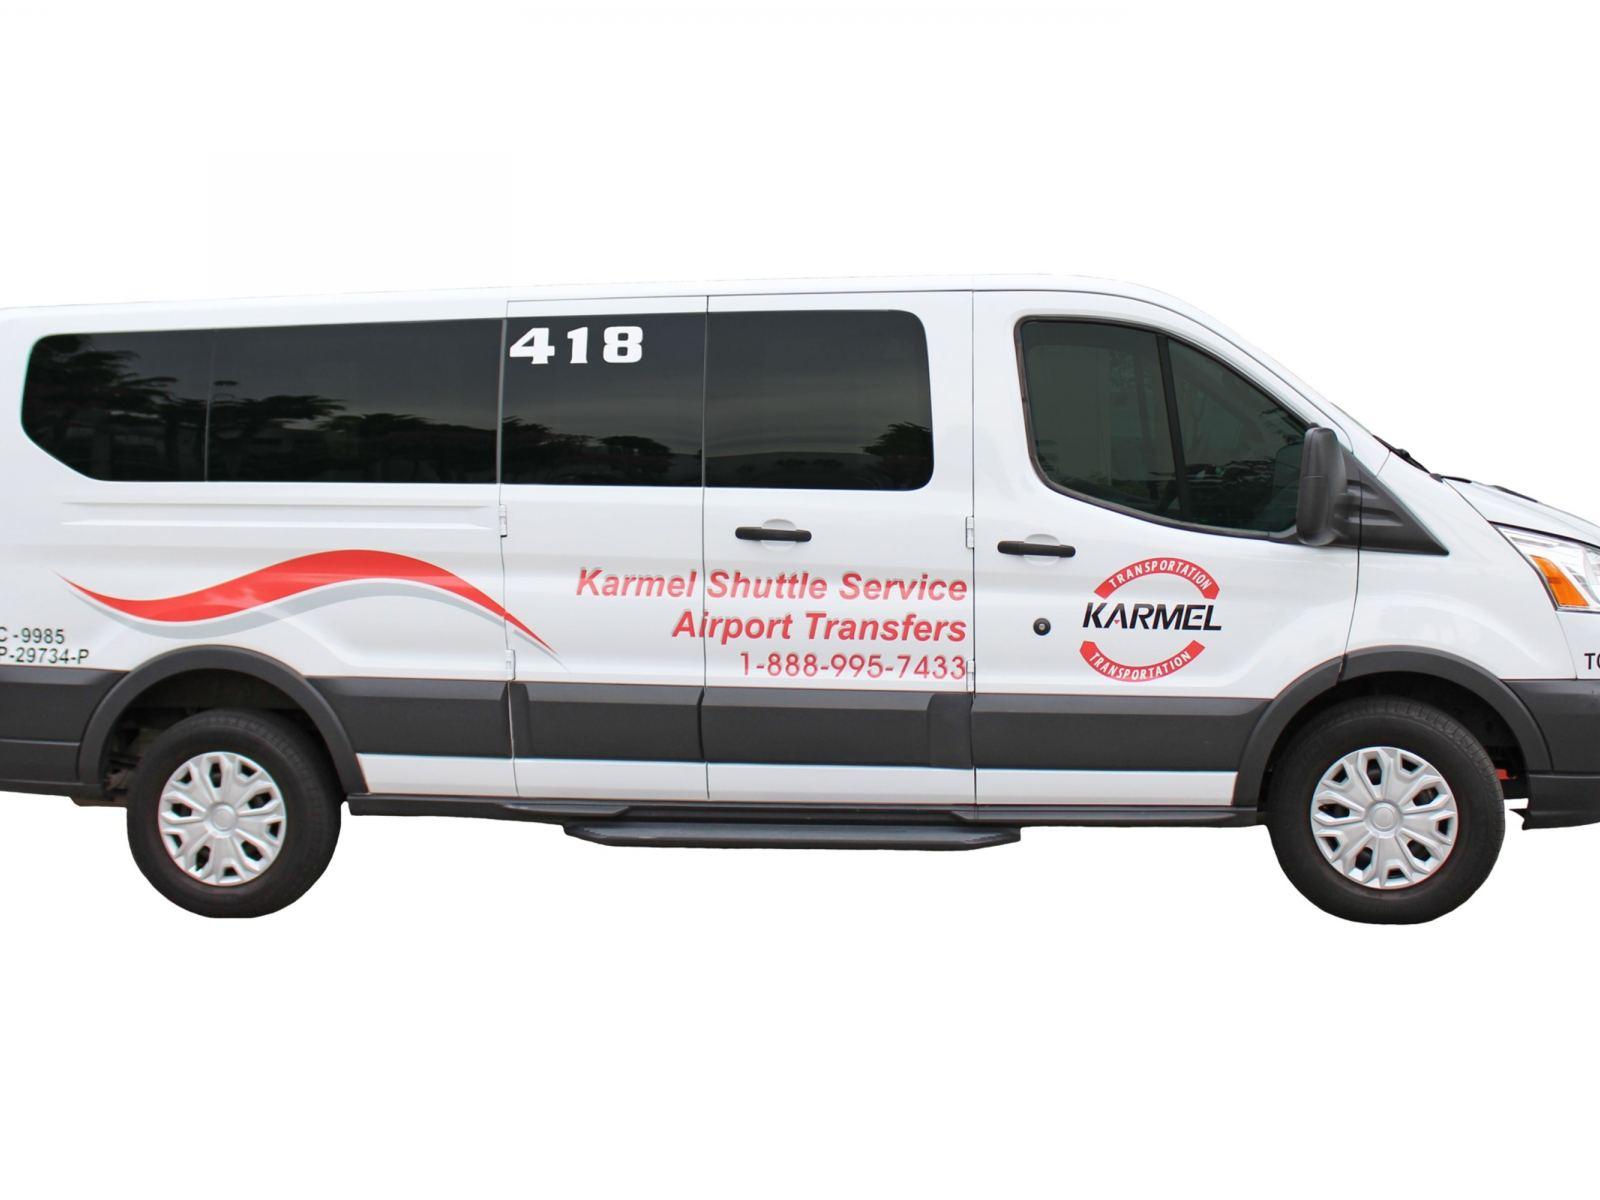 Minivan clipart van shuttle. Karmel service discover los